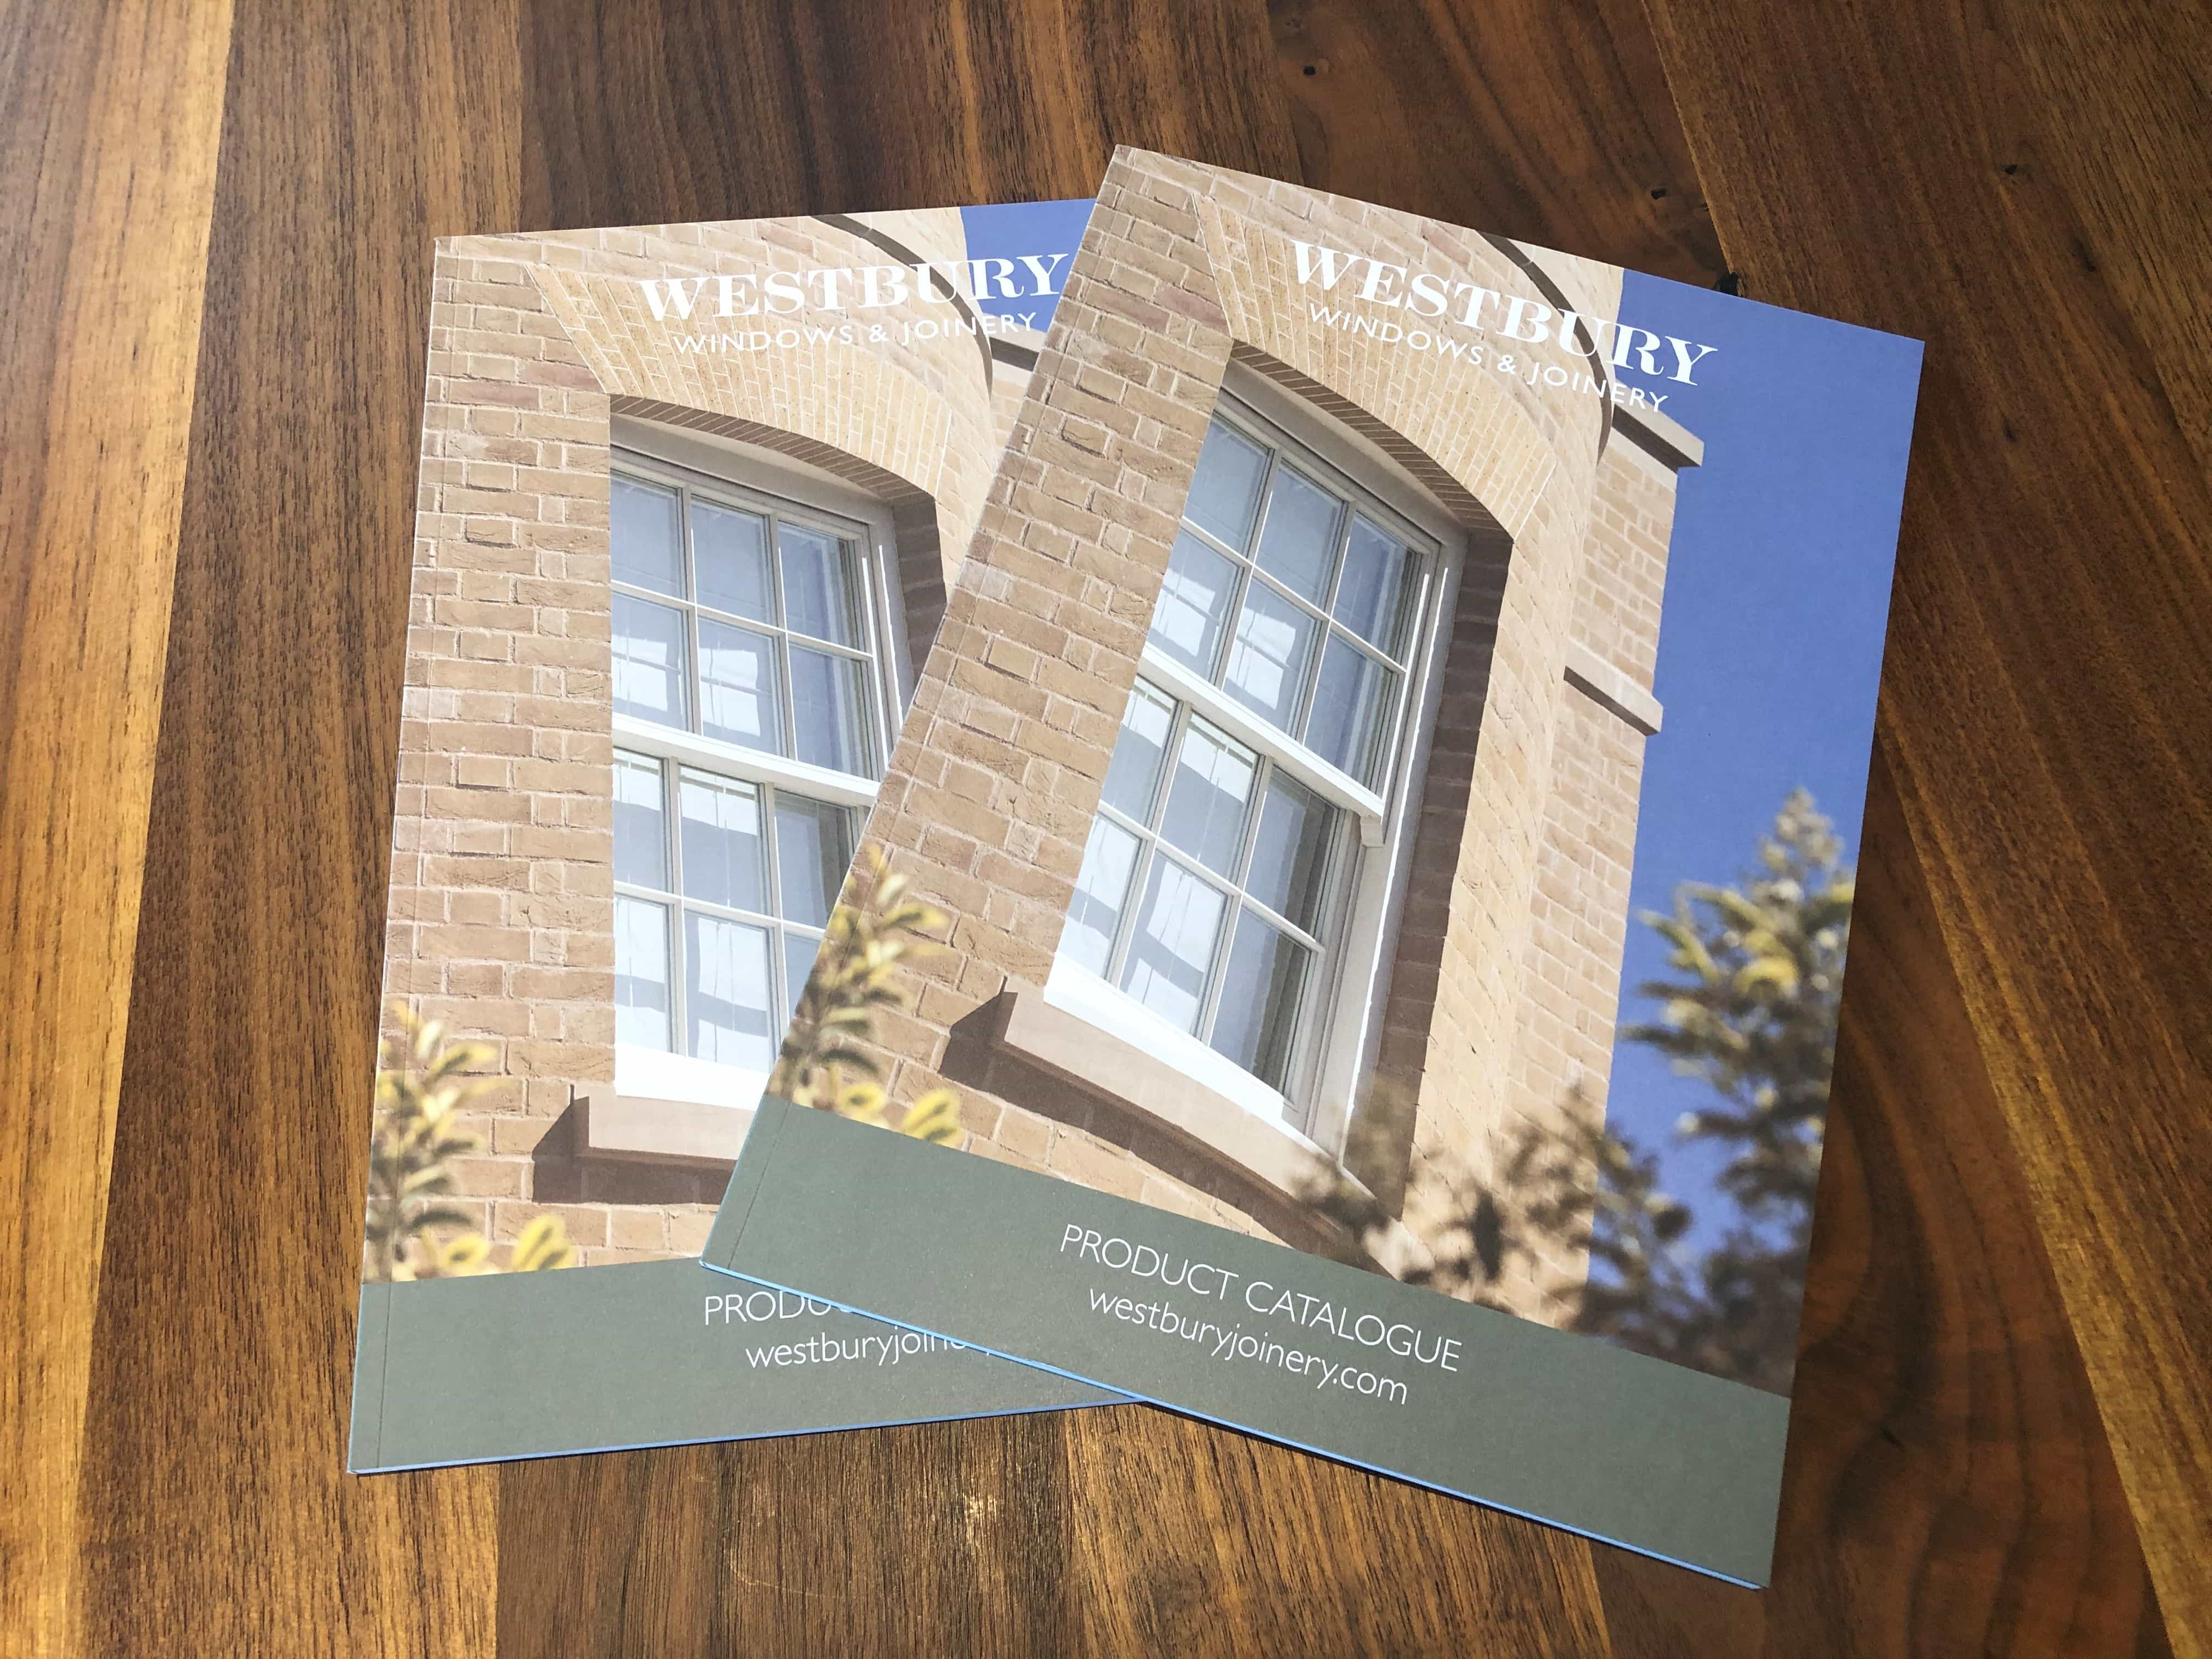 Westbury brochure